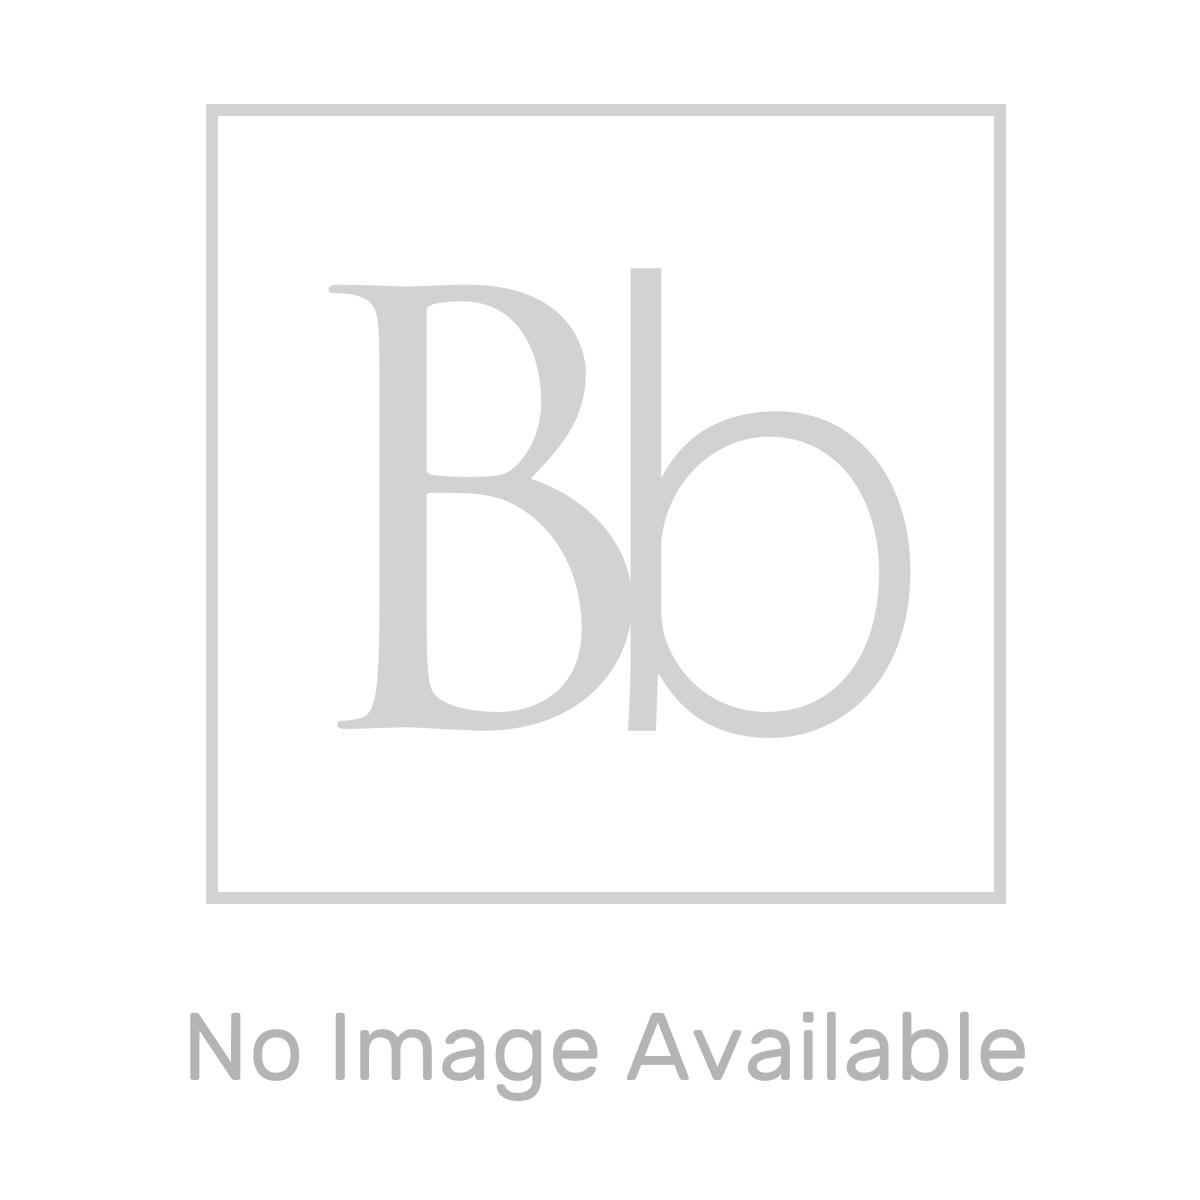 April Rectangular Anti Slip Shower Tray 1200 x 900 Line Drawing